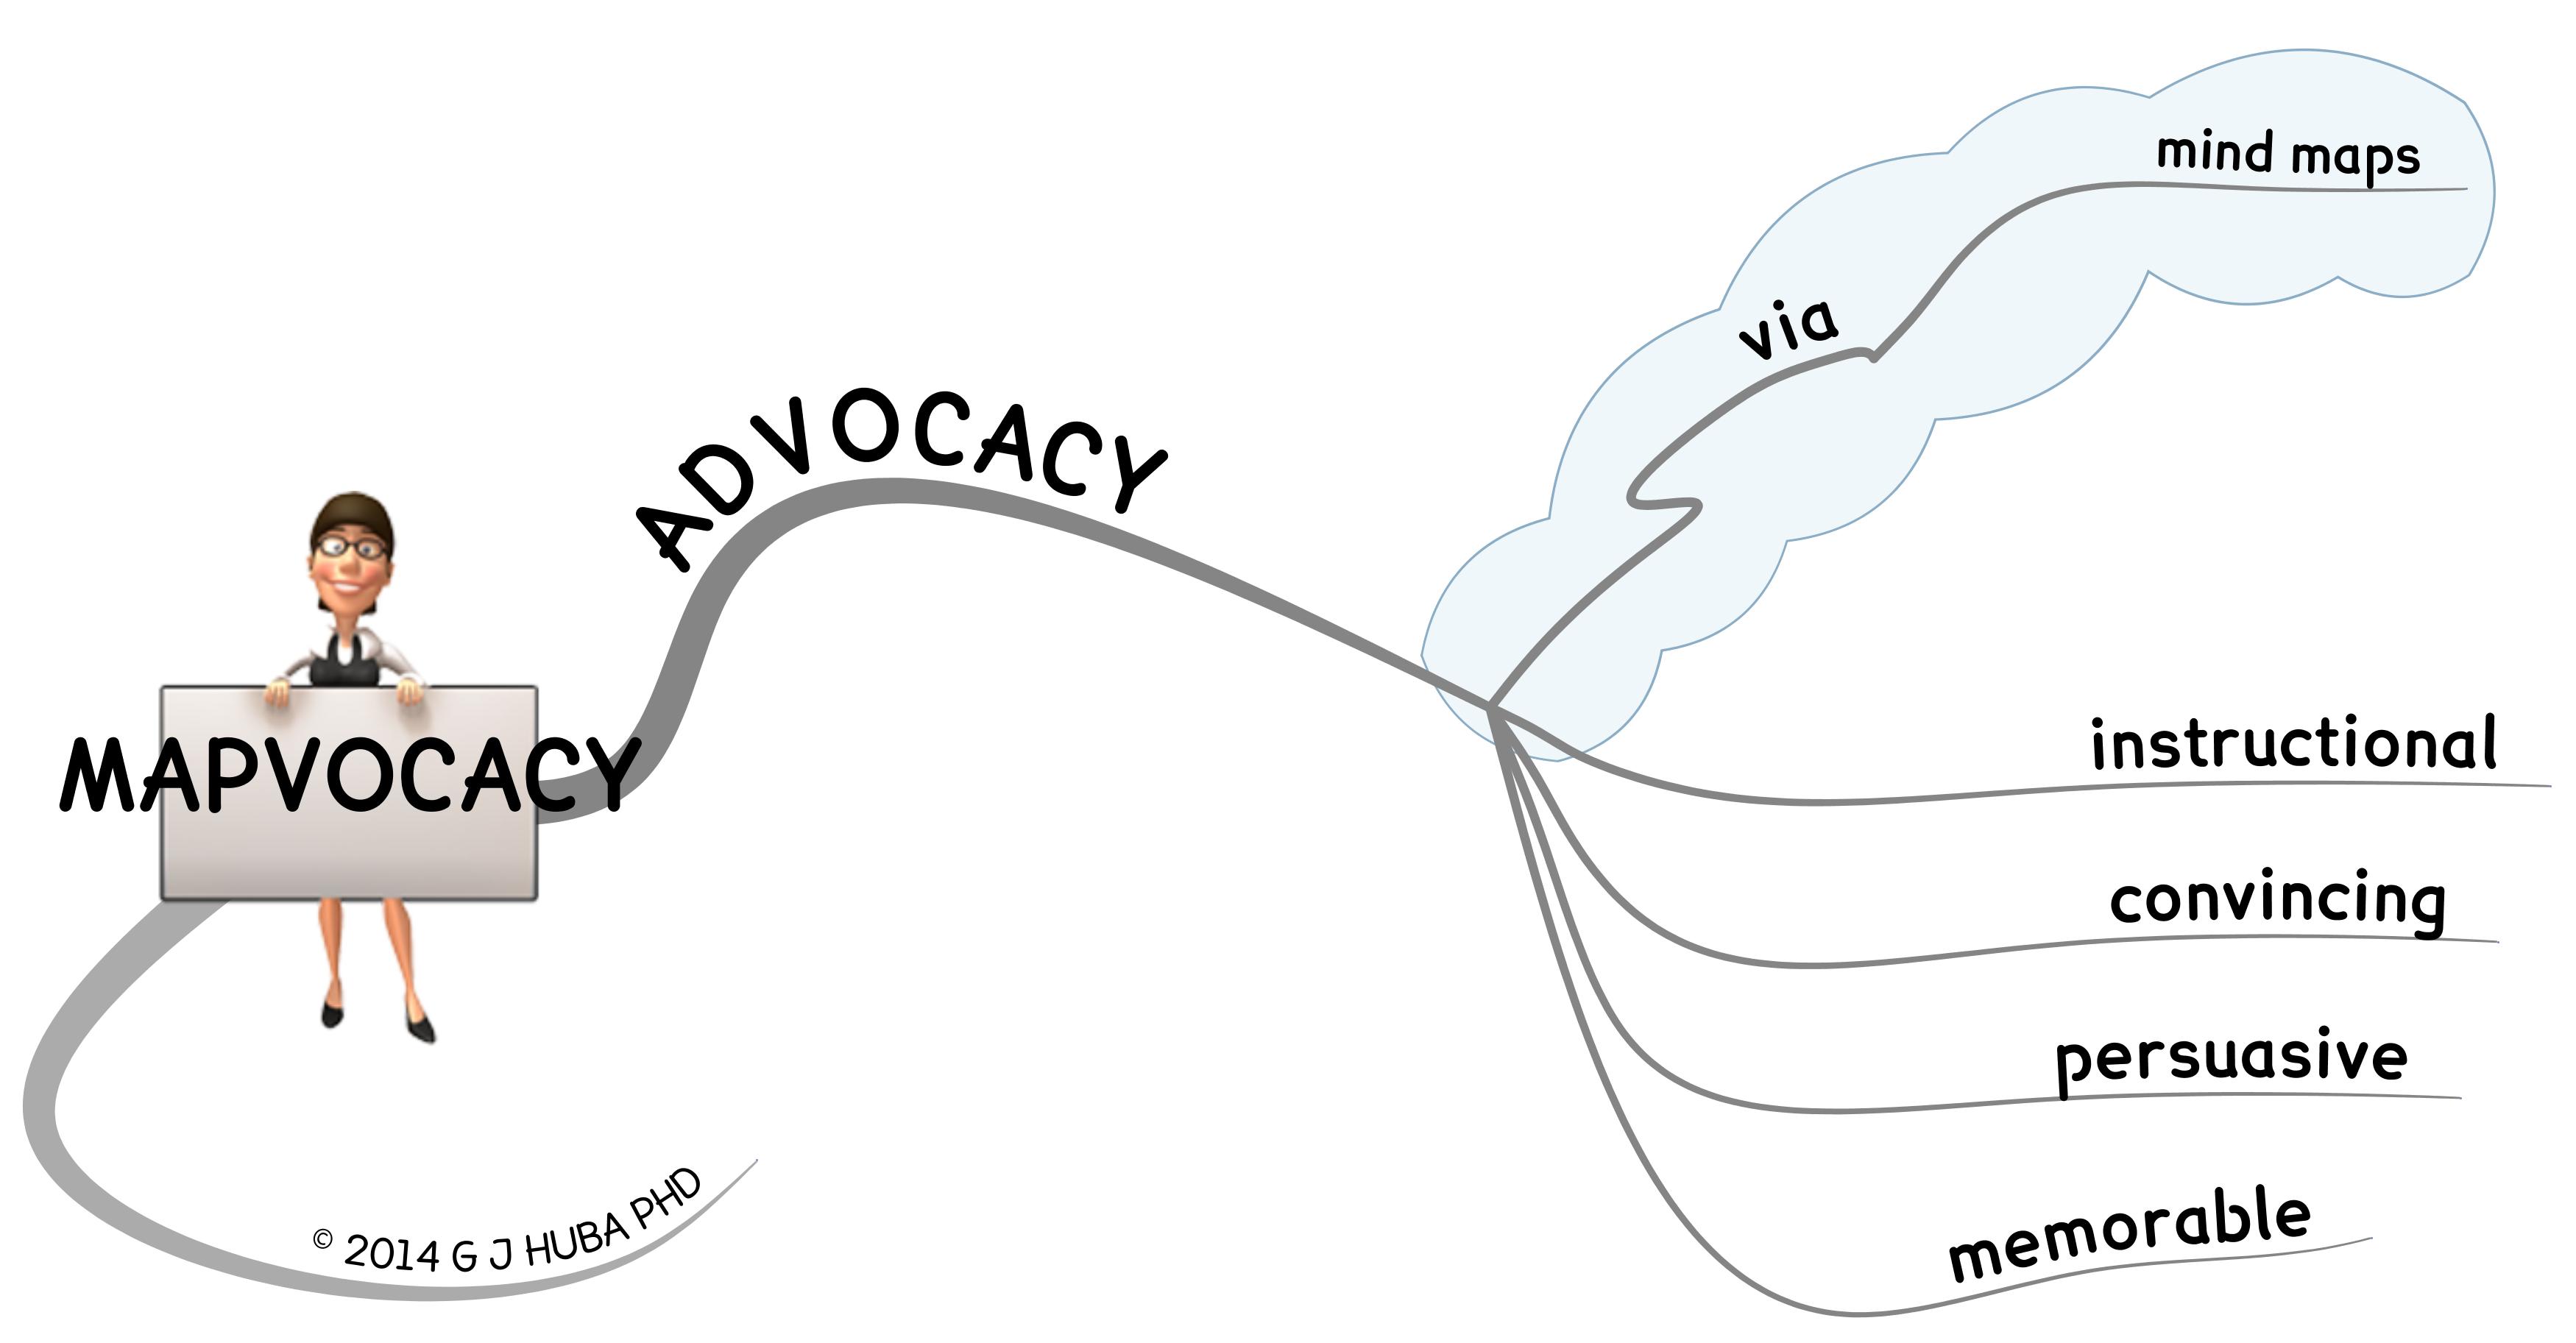 mapvocacylexireadable